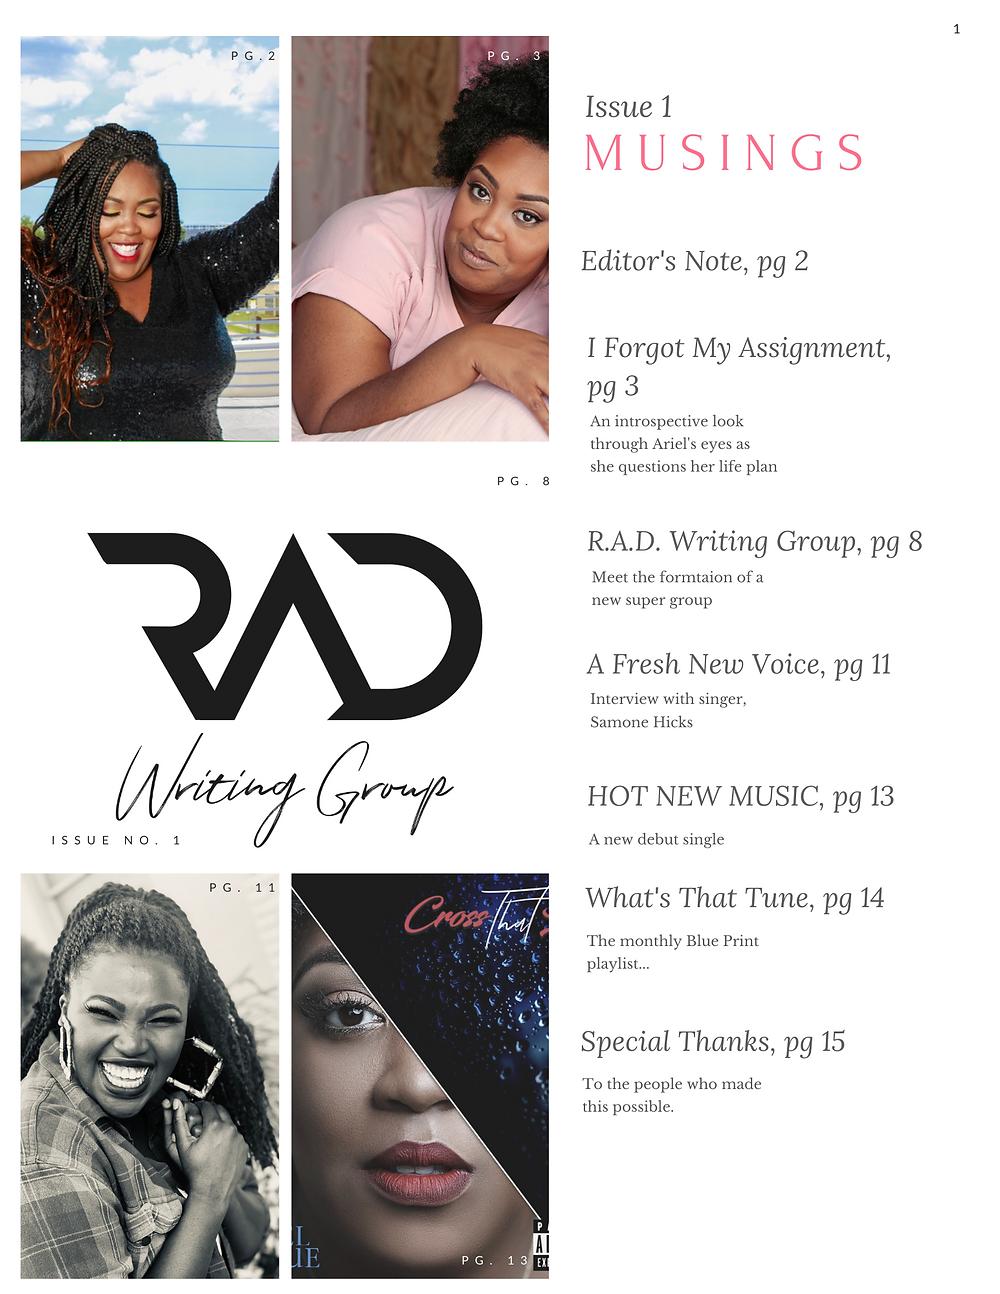 Blue Print Contents page, Sept 2020